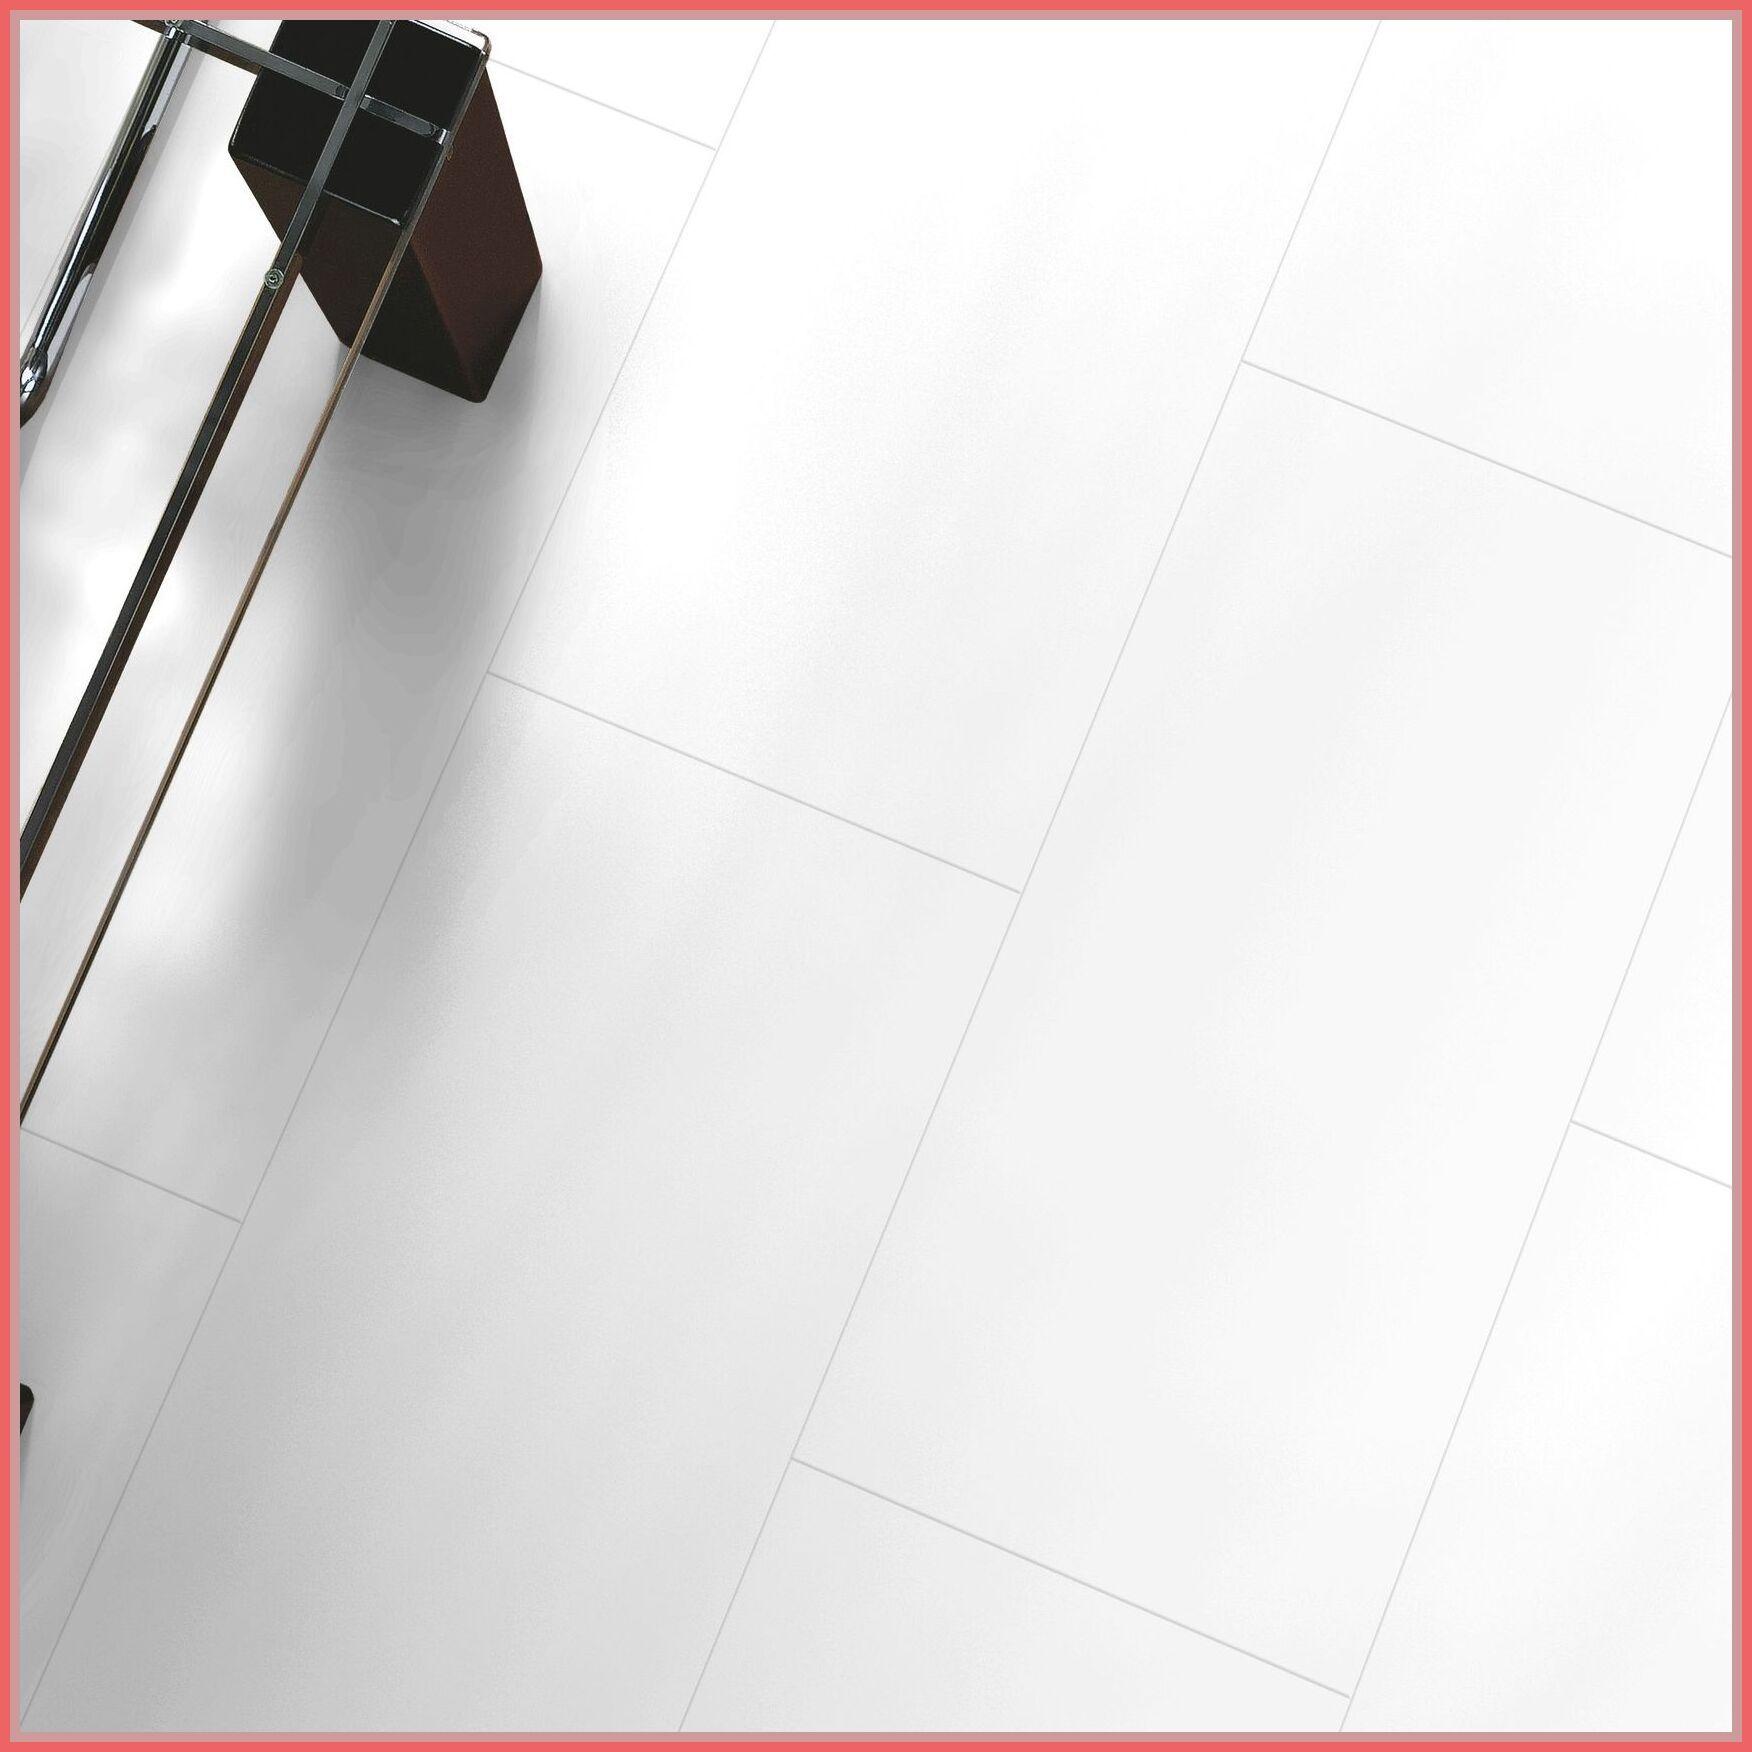 38 Reference Of Floor Tile White Waterproofing In 2020 Tile Floor Flooring Unique Subway Tile